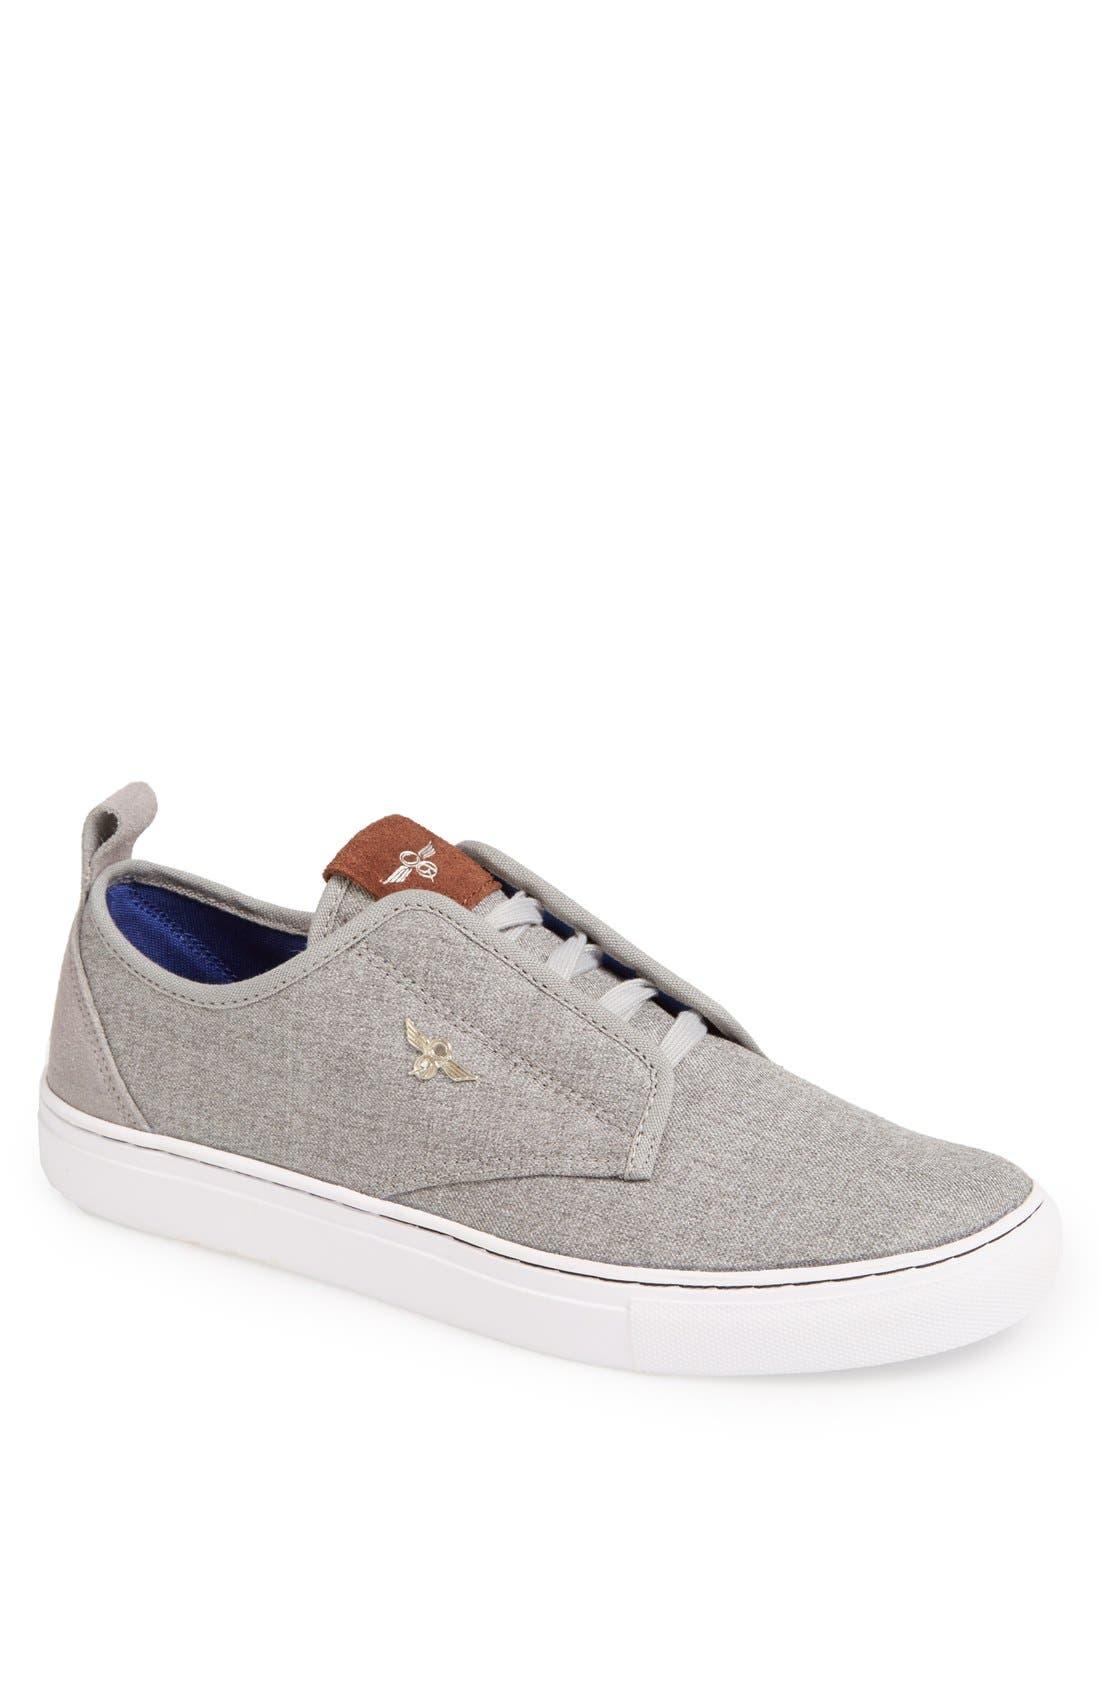 Main Image - Creative Recreation 'Lacava' Sneaker (Men)